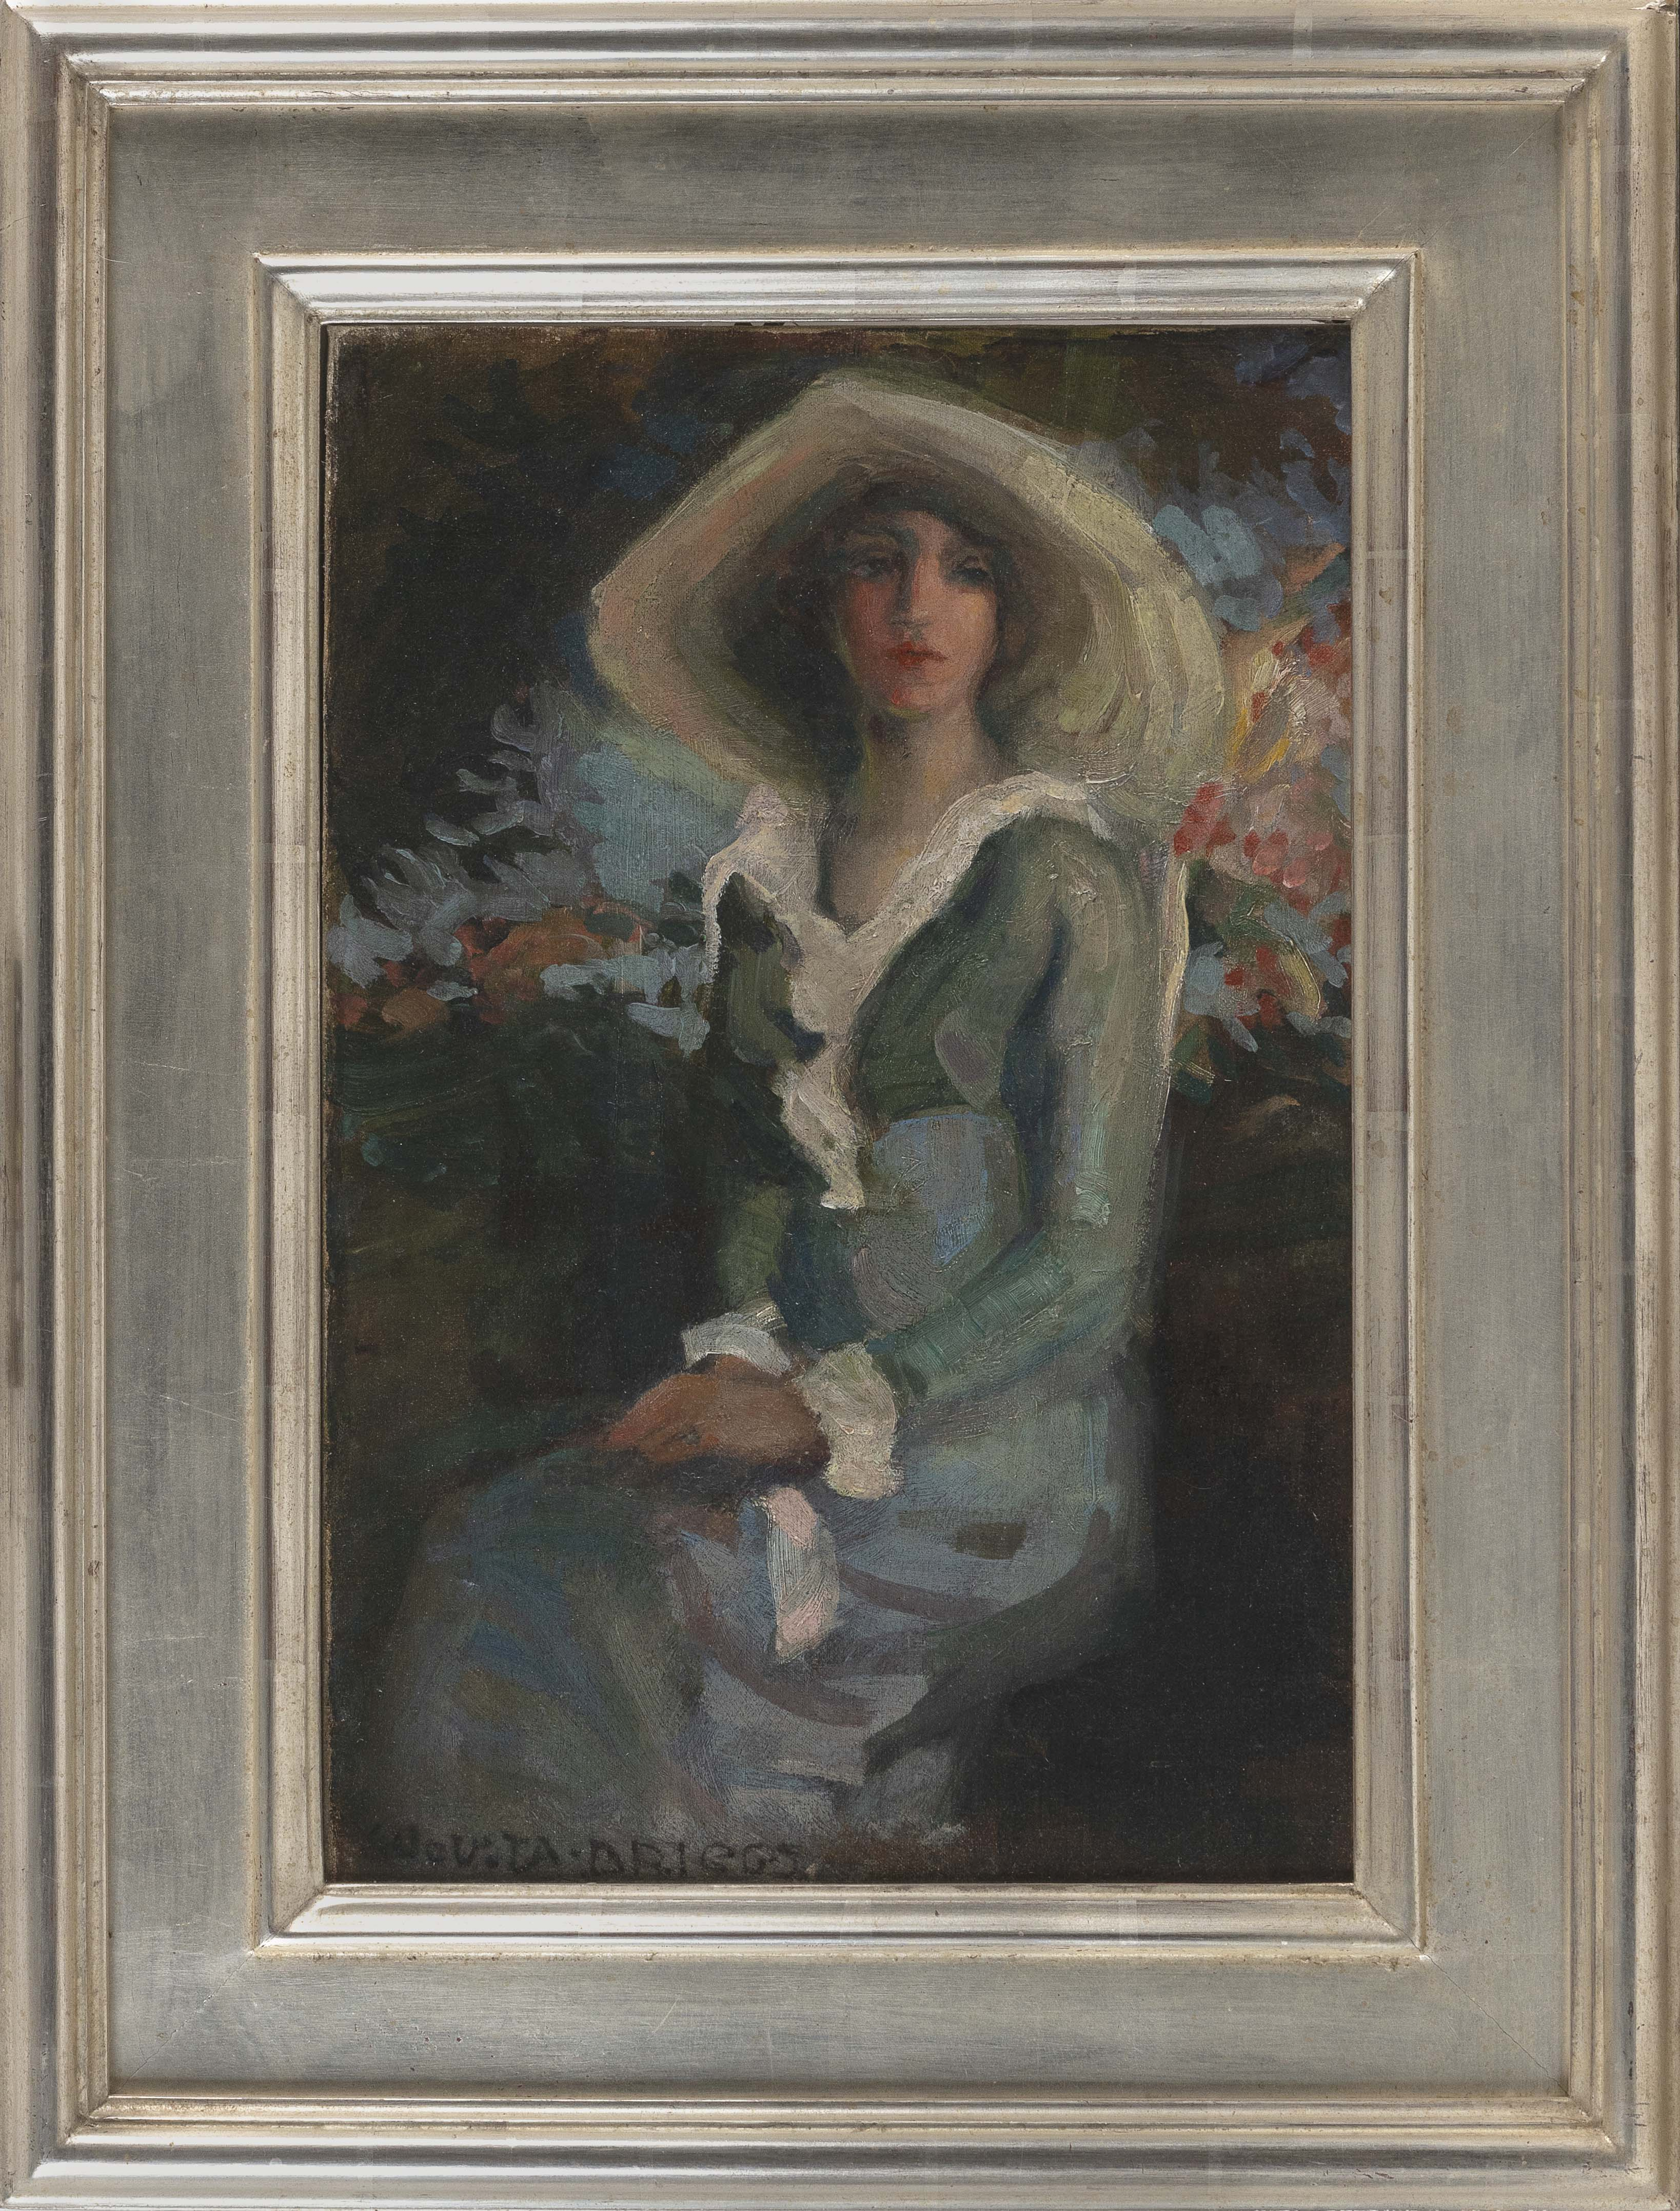 "BRIGGS (American,), Portrait of a woman., Oil on canvas, 18"" x 12"". Framed 25"" x 19""."